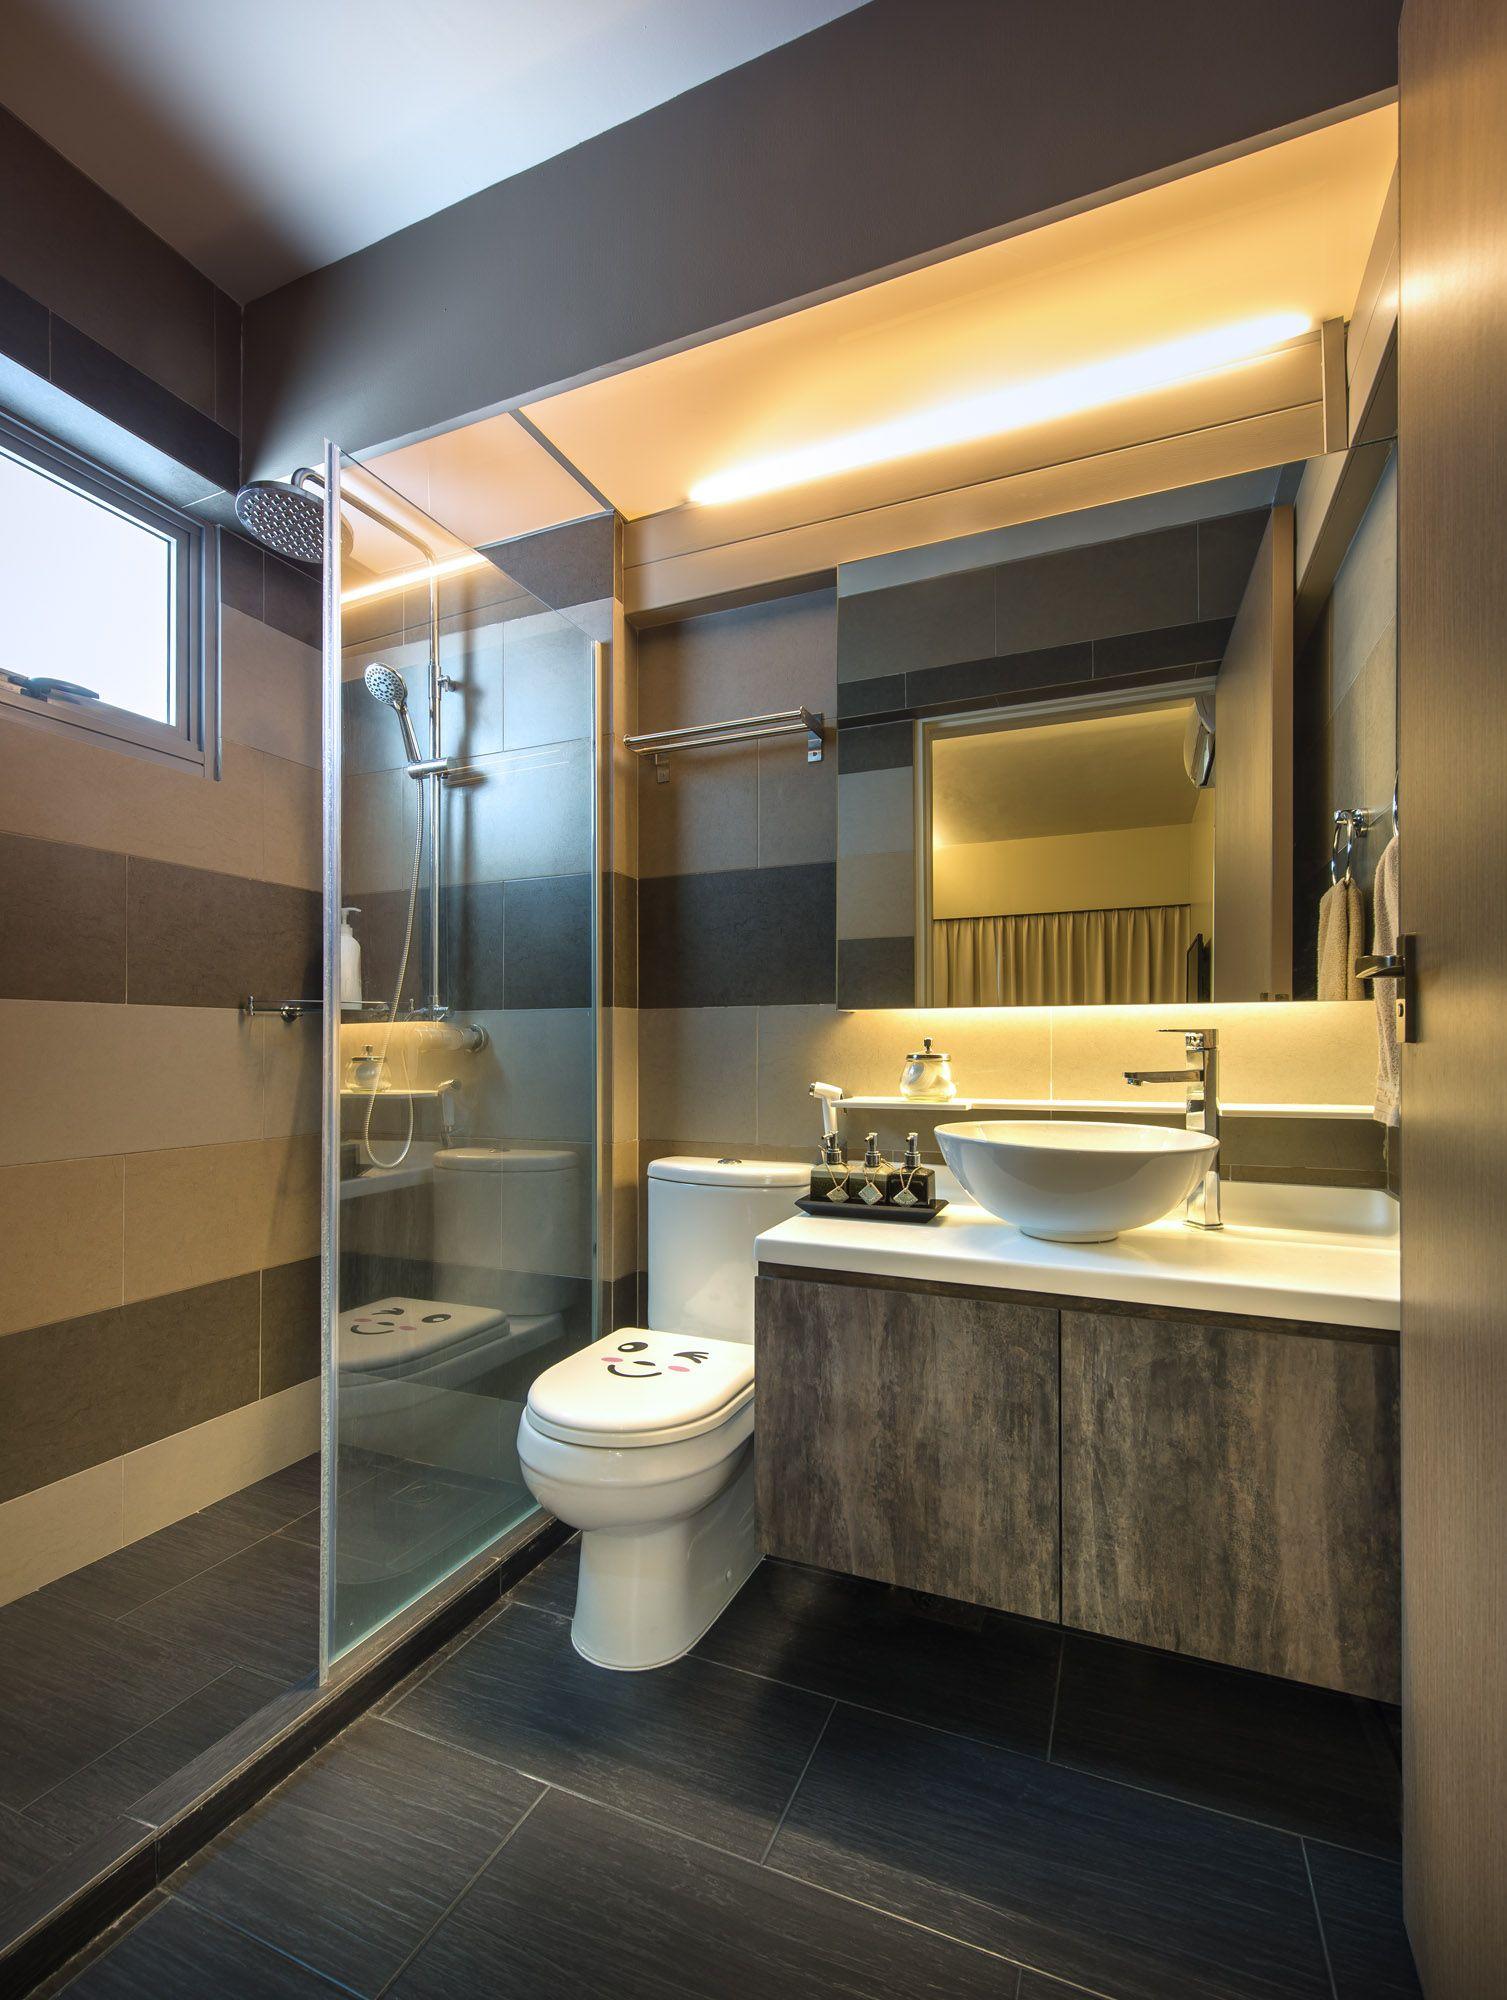 Flexi 2 Room Interior Design: Interior Design By Rezt 'n Relax Of Singapore